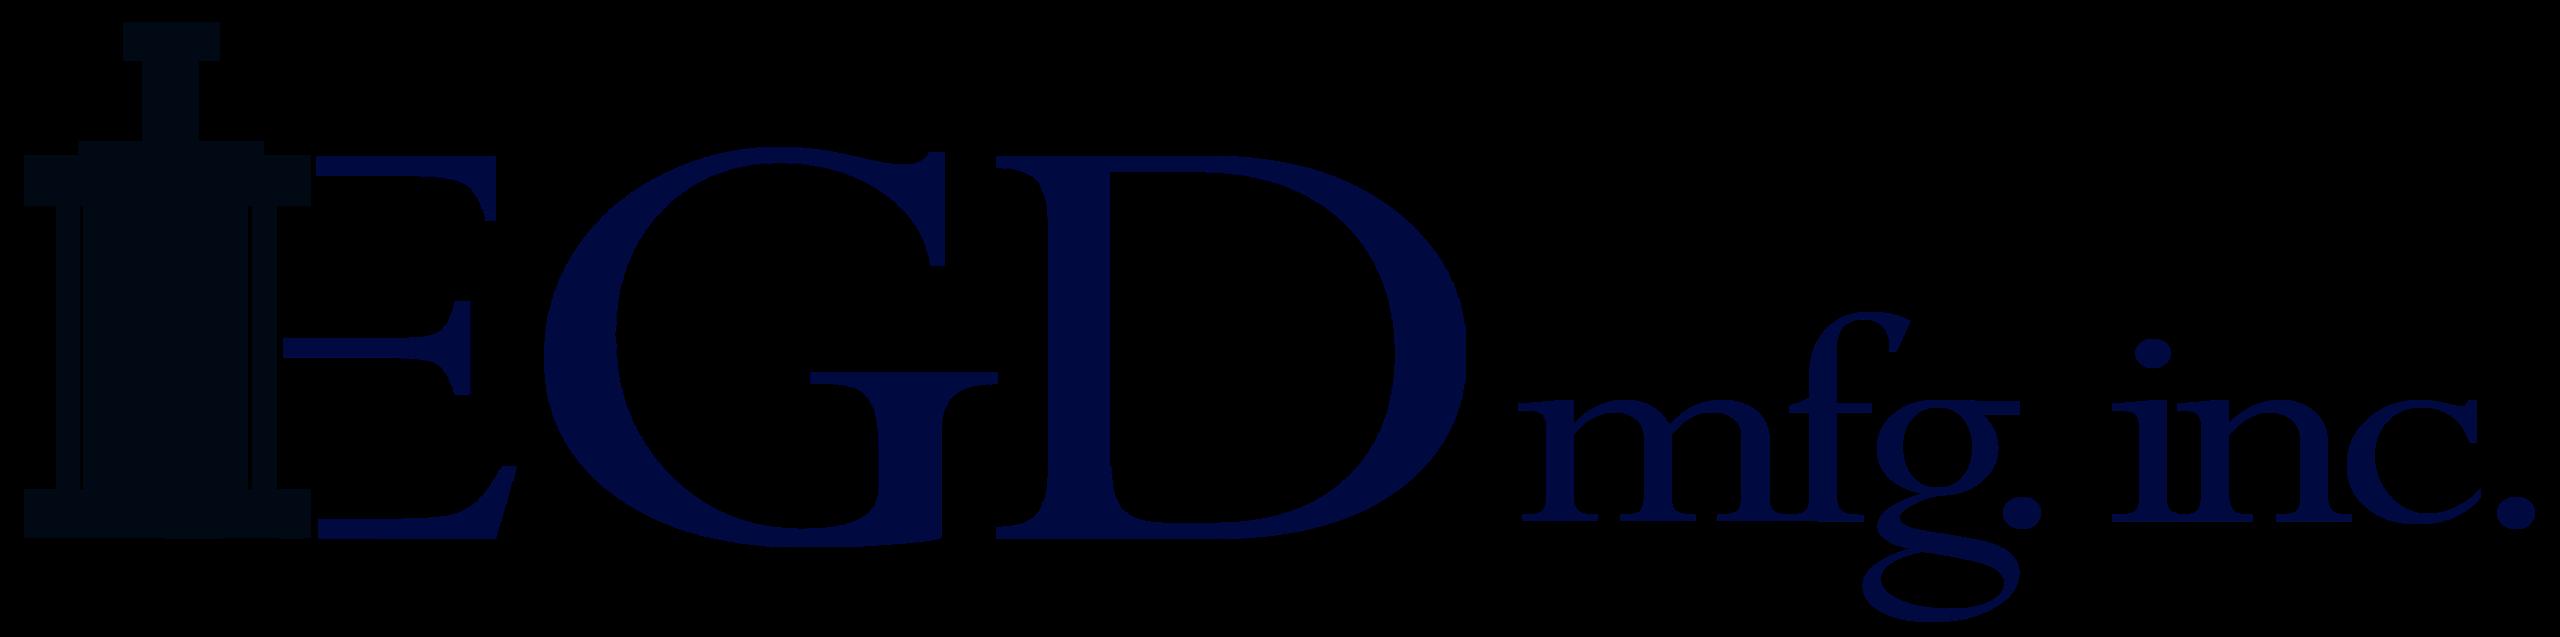 EGD Mfg, Inc. - Home